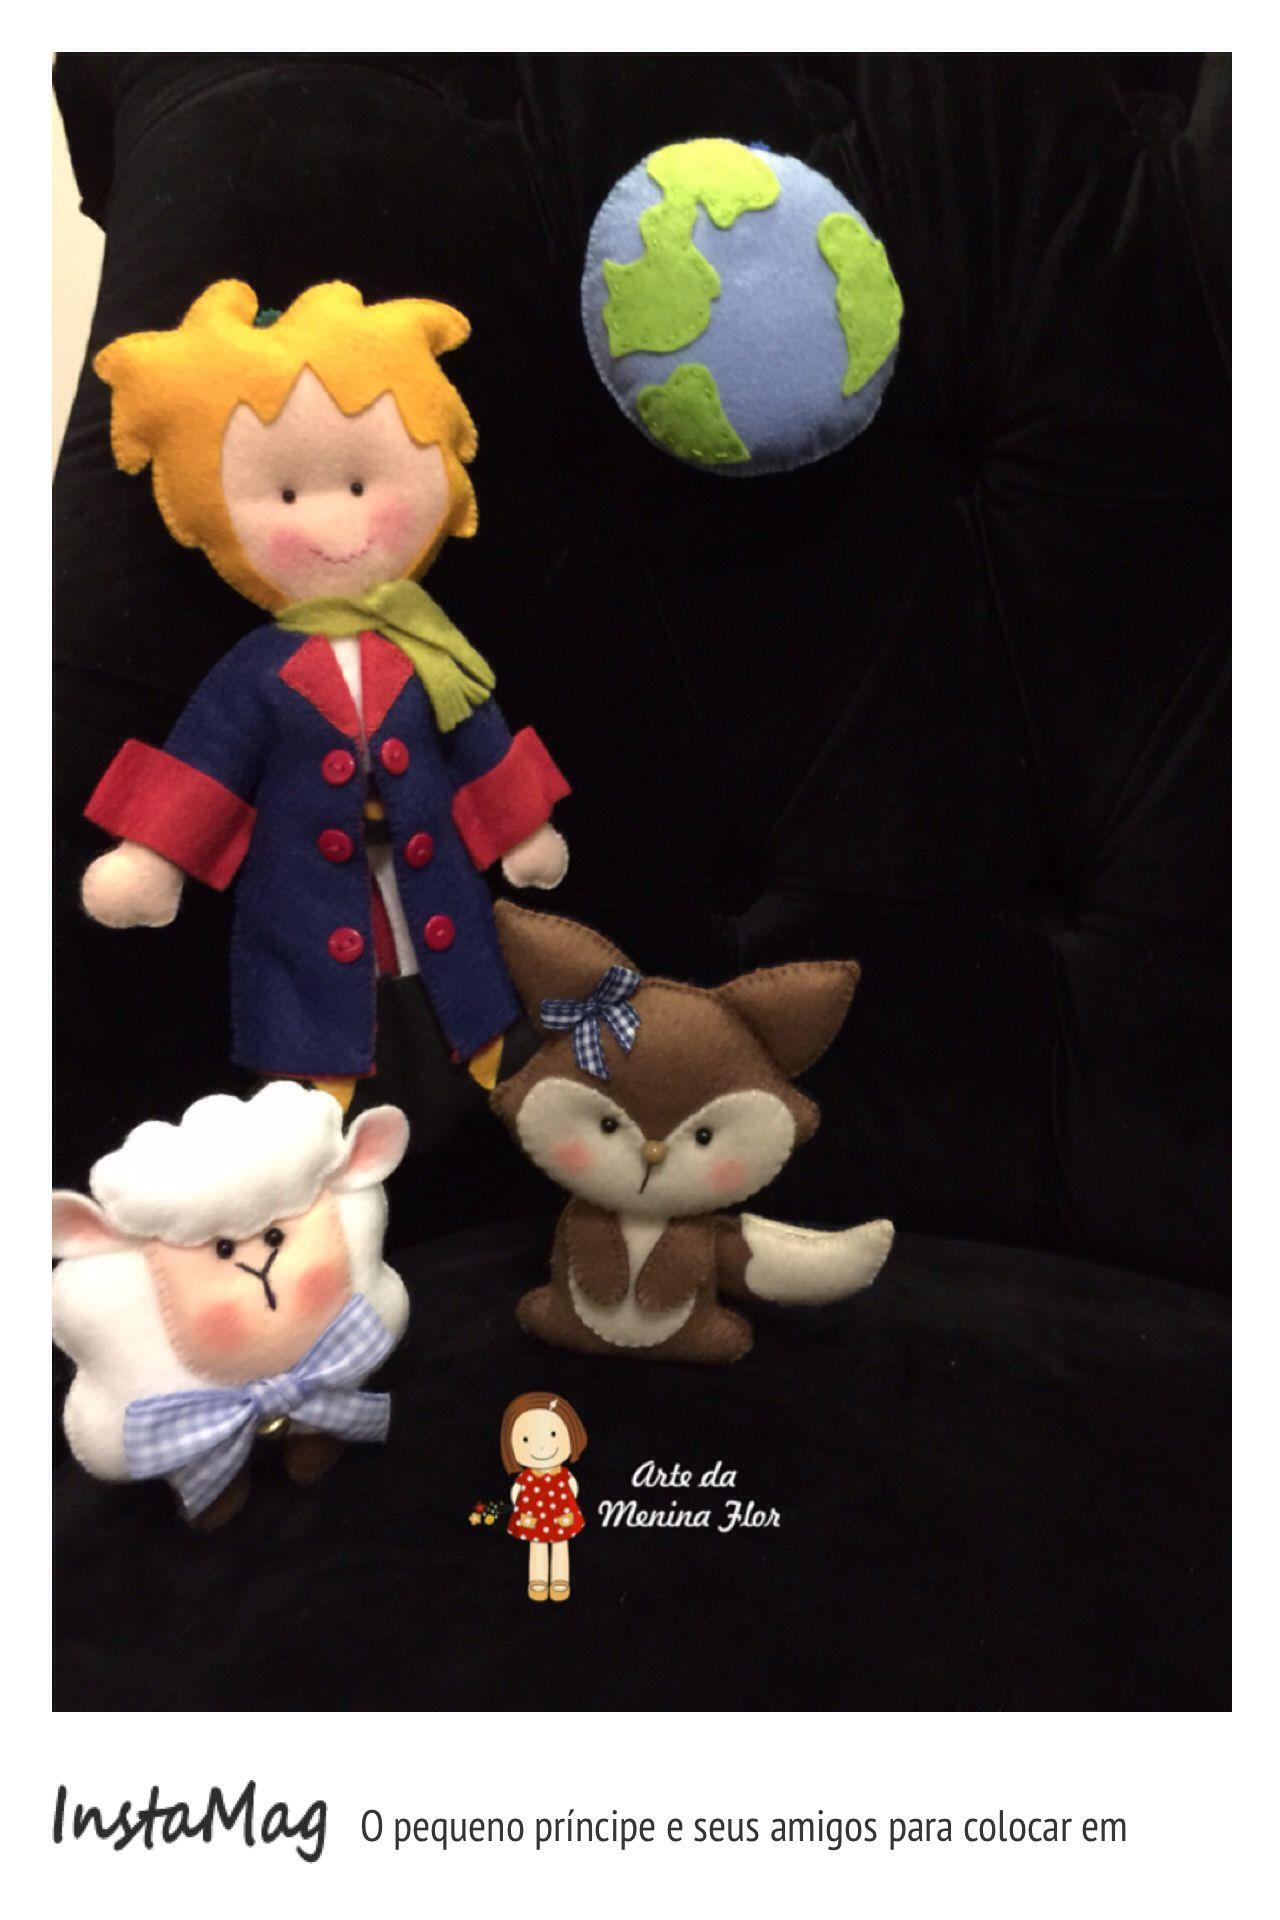 Pequeno príncipe e seus amados amigos